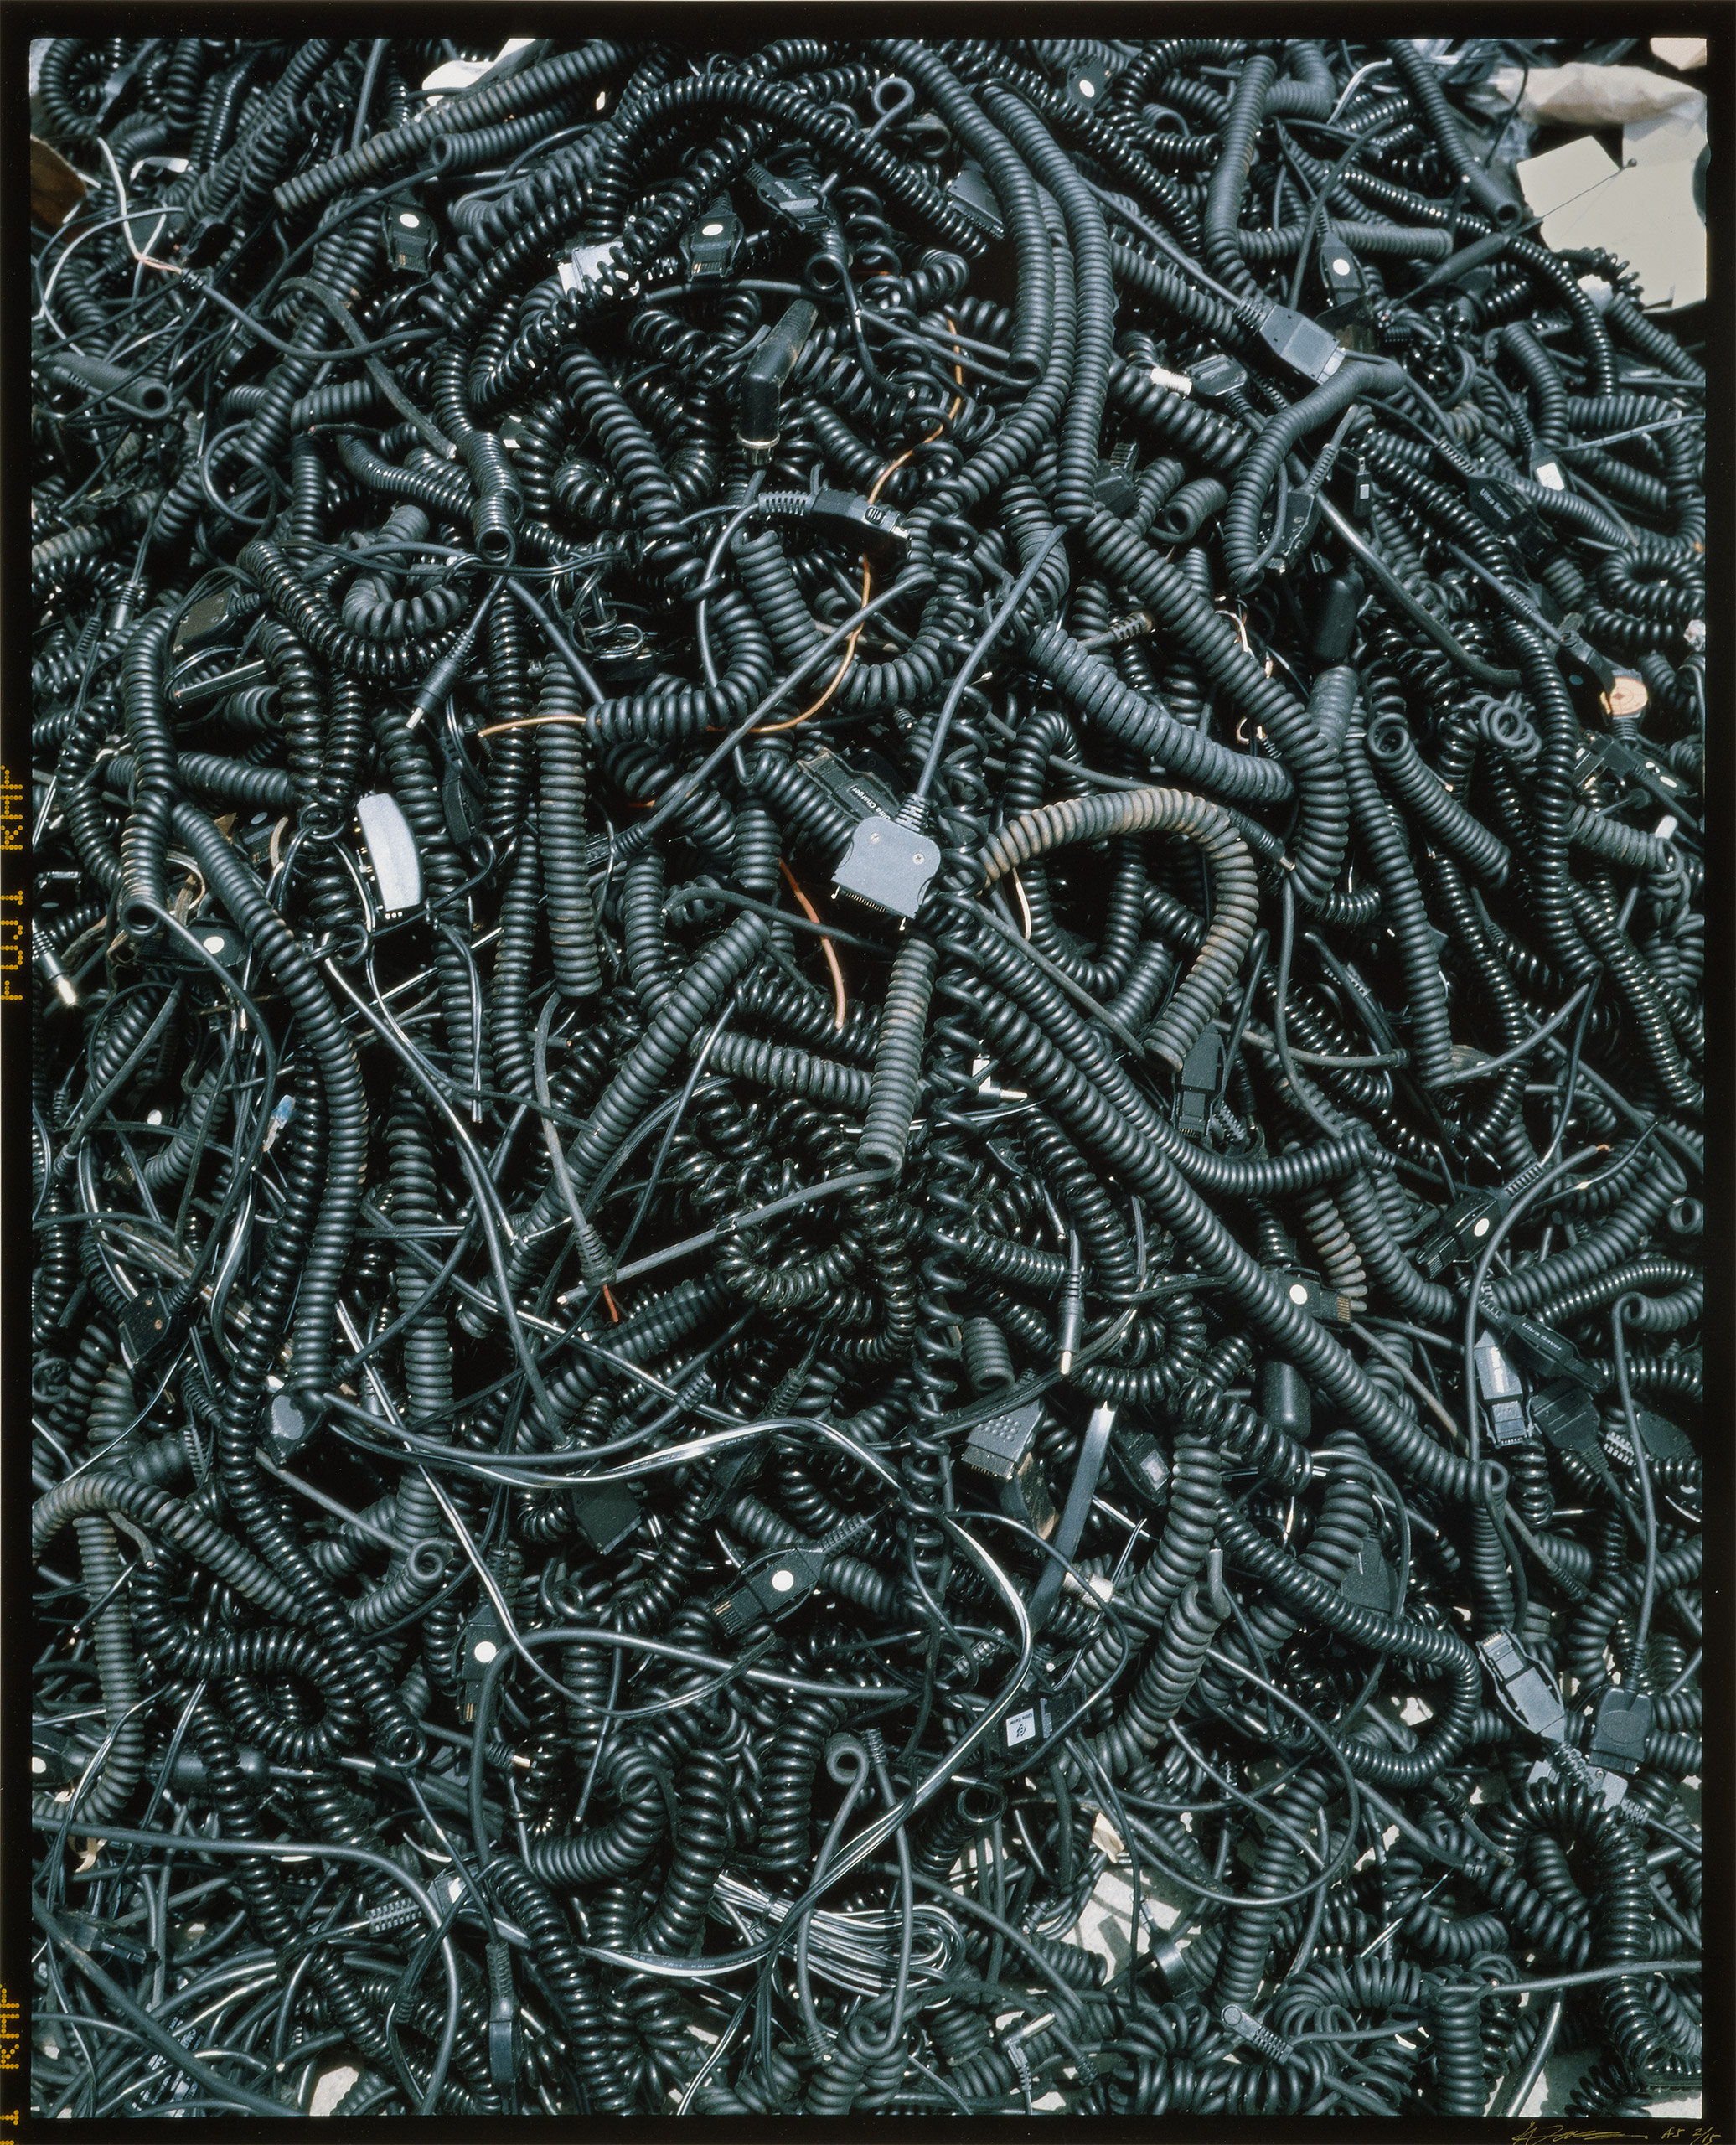 disCONNEXION #a5, 2005The J. Paul Getty Museum, Los Angeles